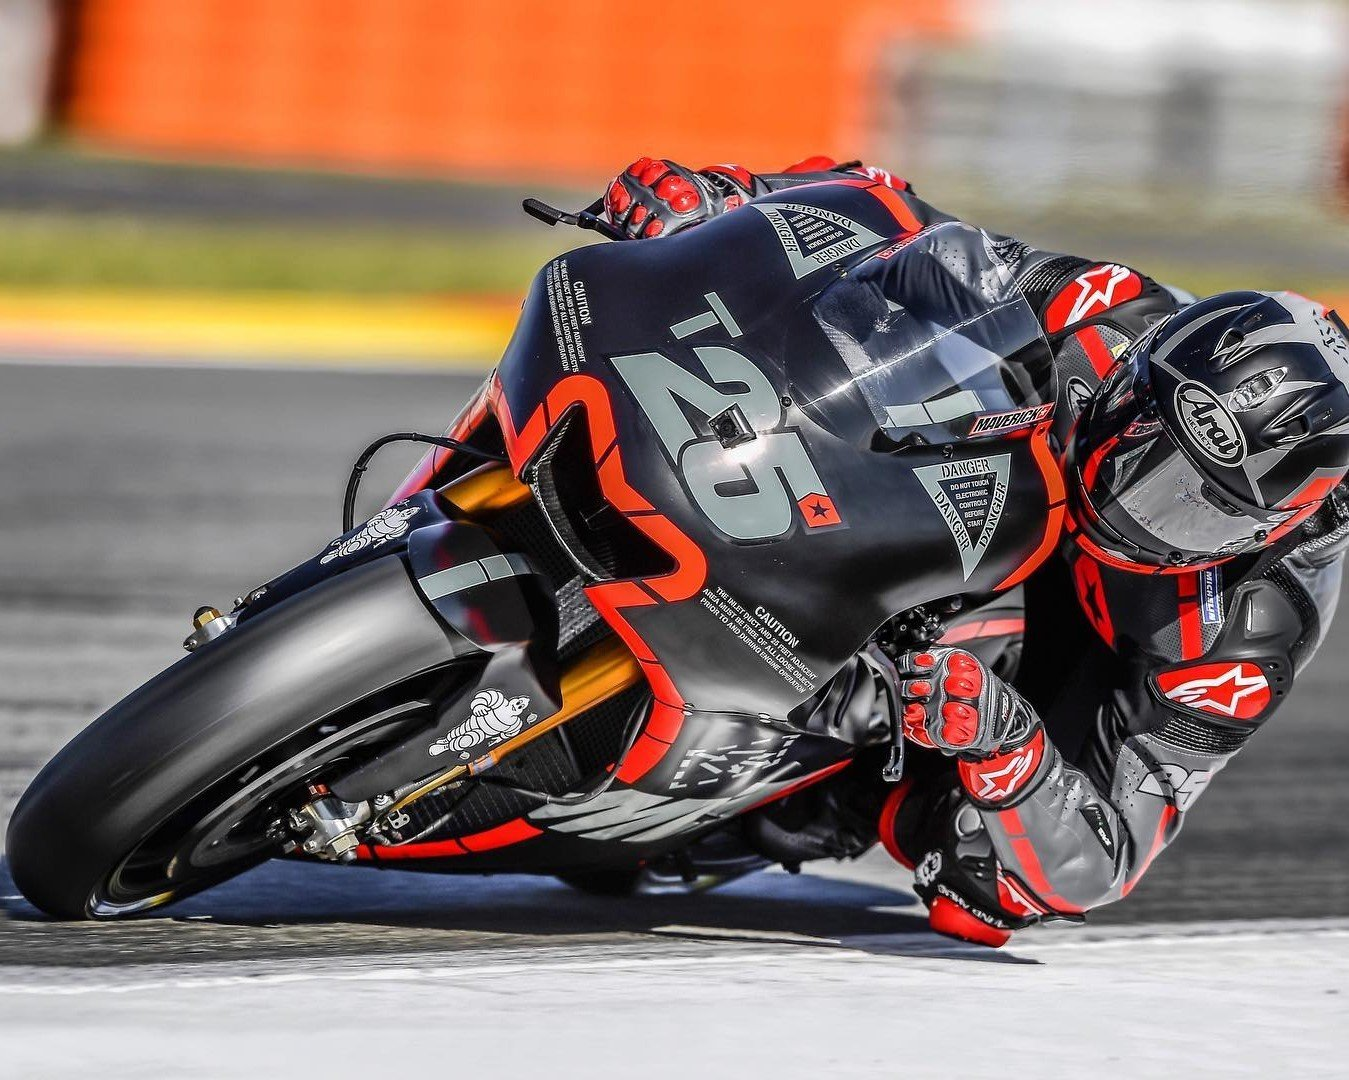 AGV Pista GP-R Project 46 Matt 2.0 | Track Racing Helmet | AGV